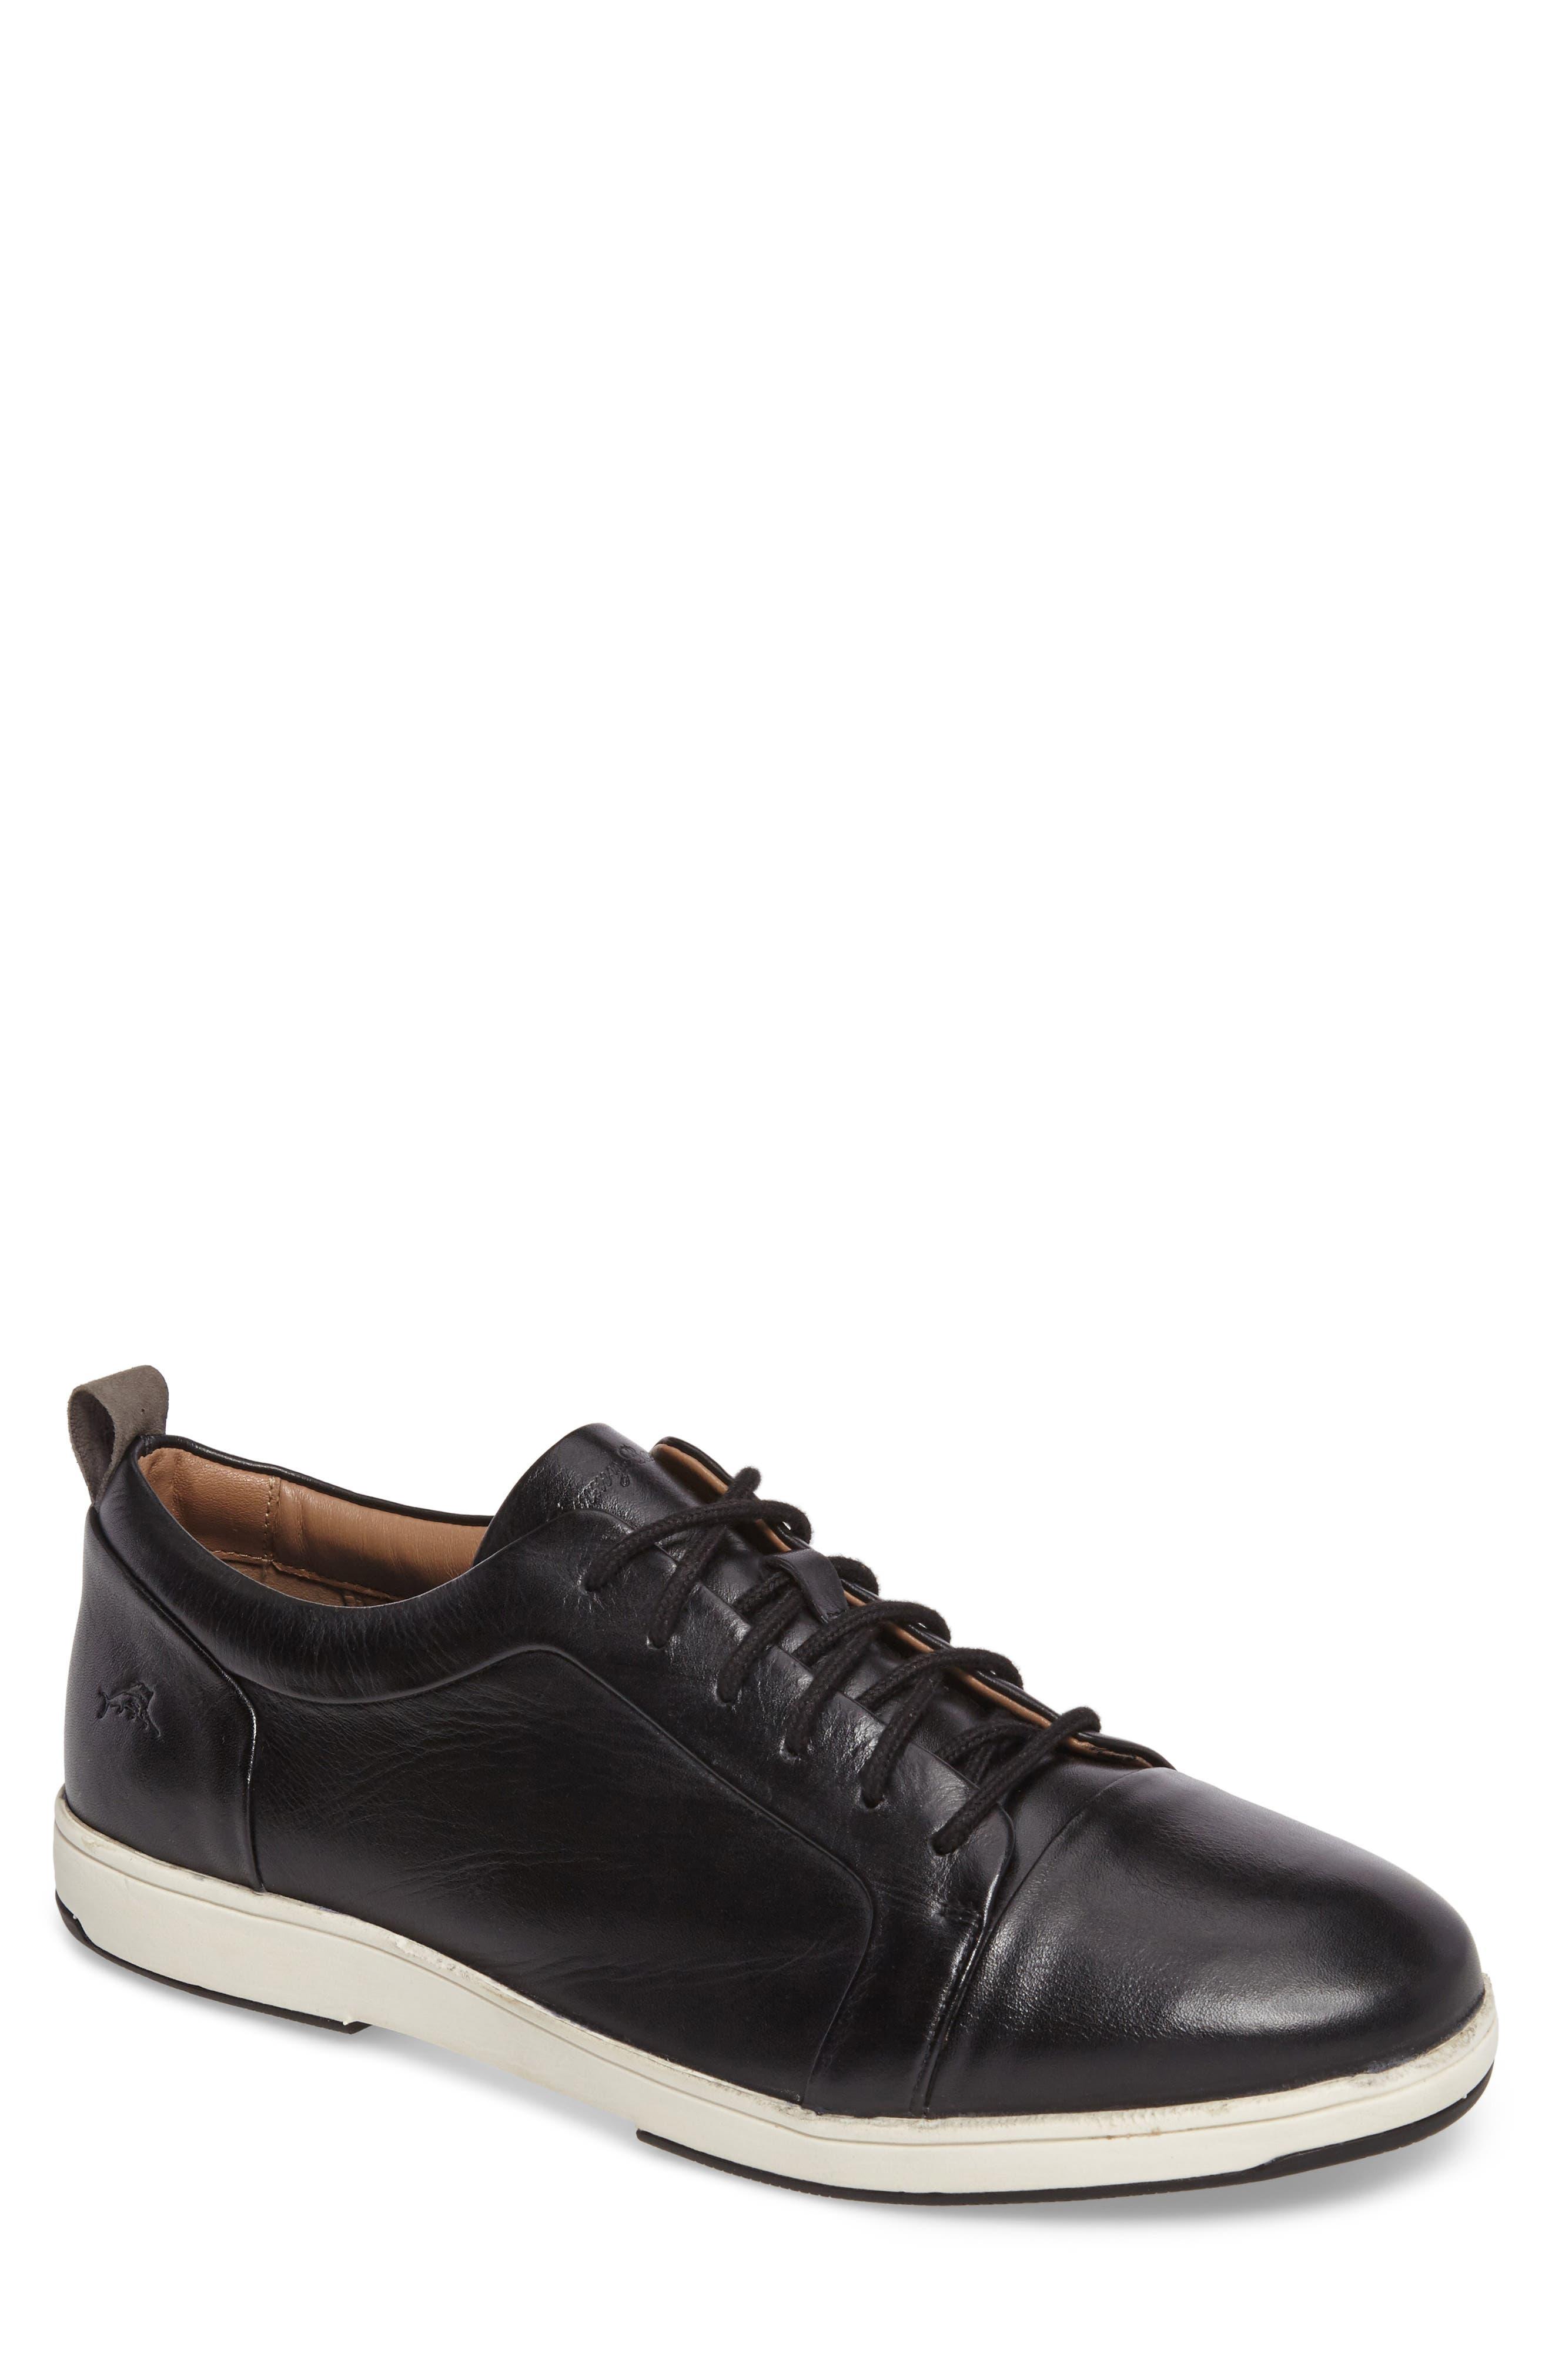 Cadiz Sneaker,                             Main thumbnail 1, color,                             001